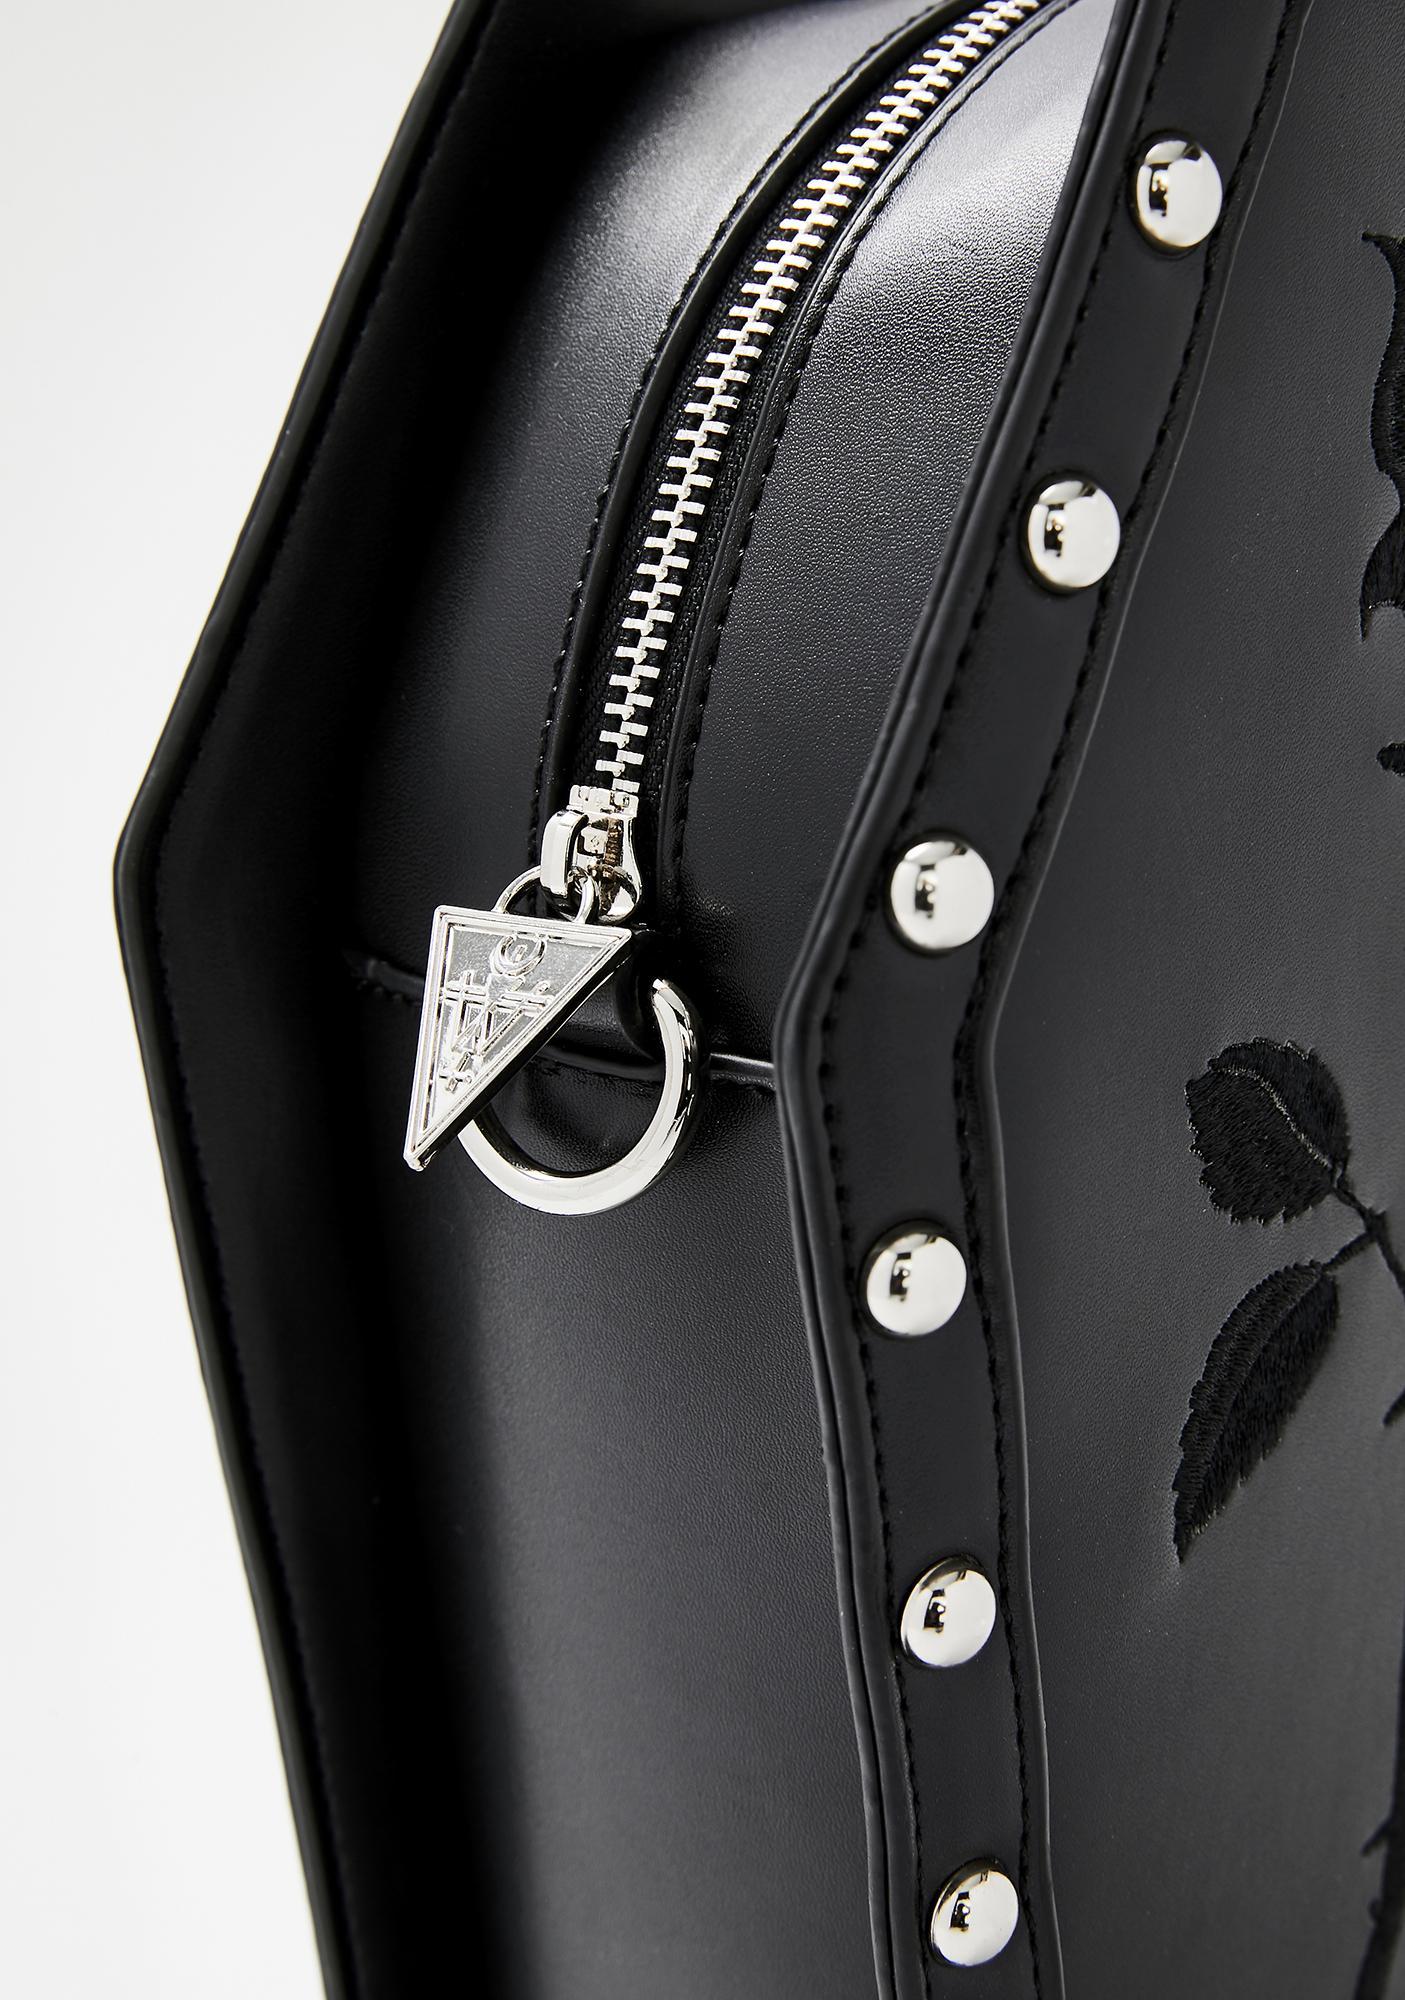 Widow Rose Resurrection Coffin Backpack